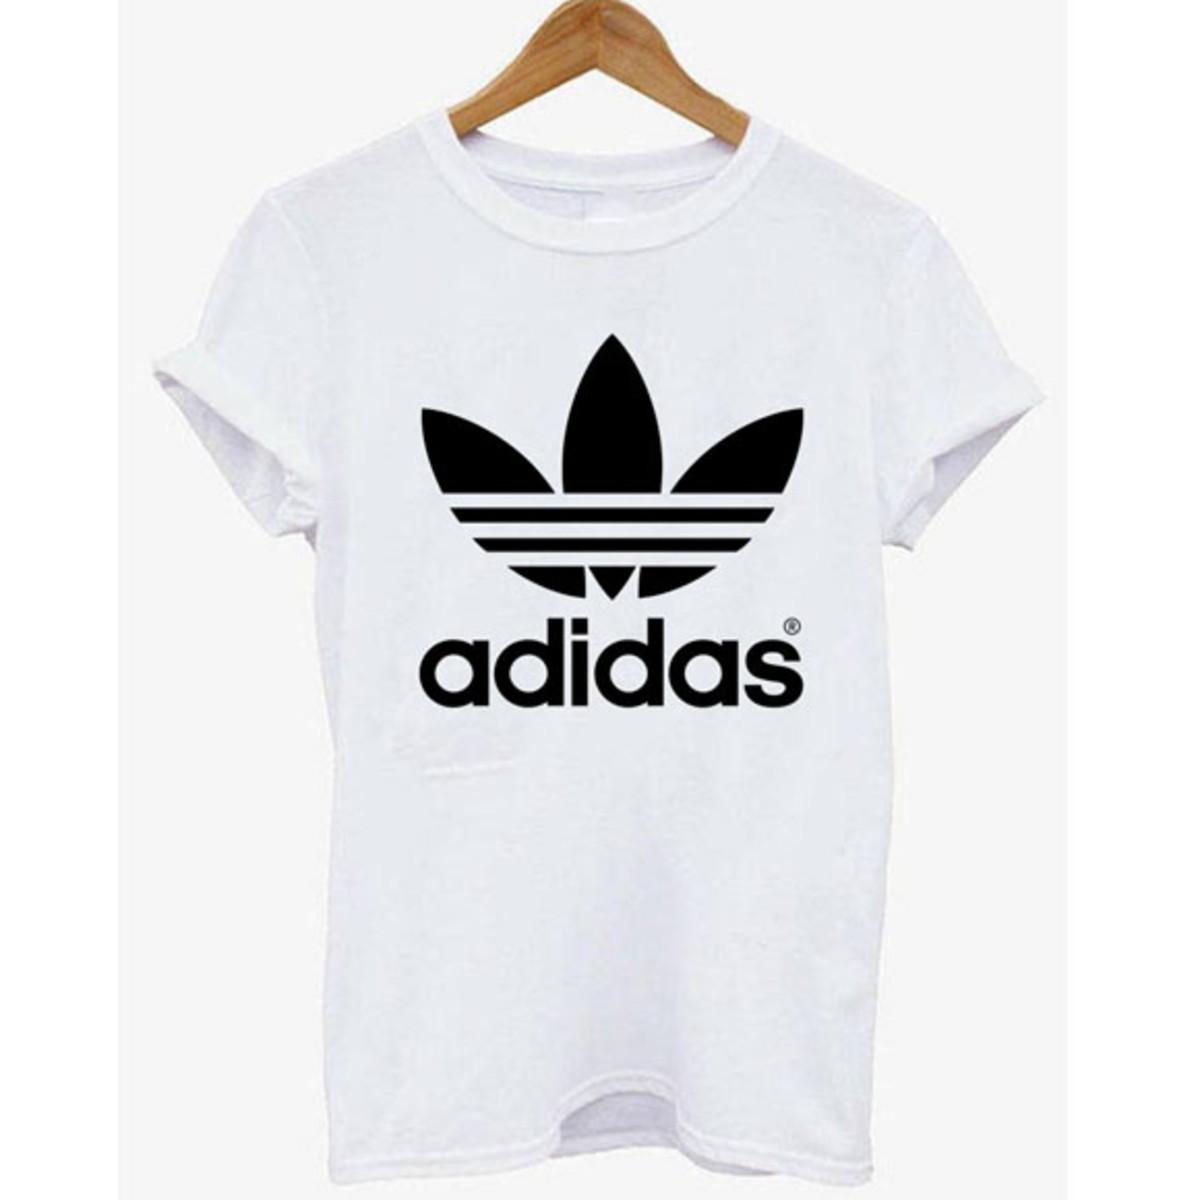 cd01ab529de Camisa Adidas Feminina Branca no Elo7